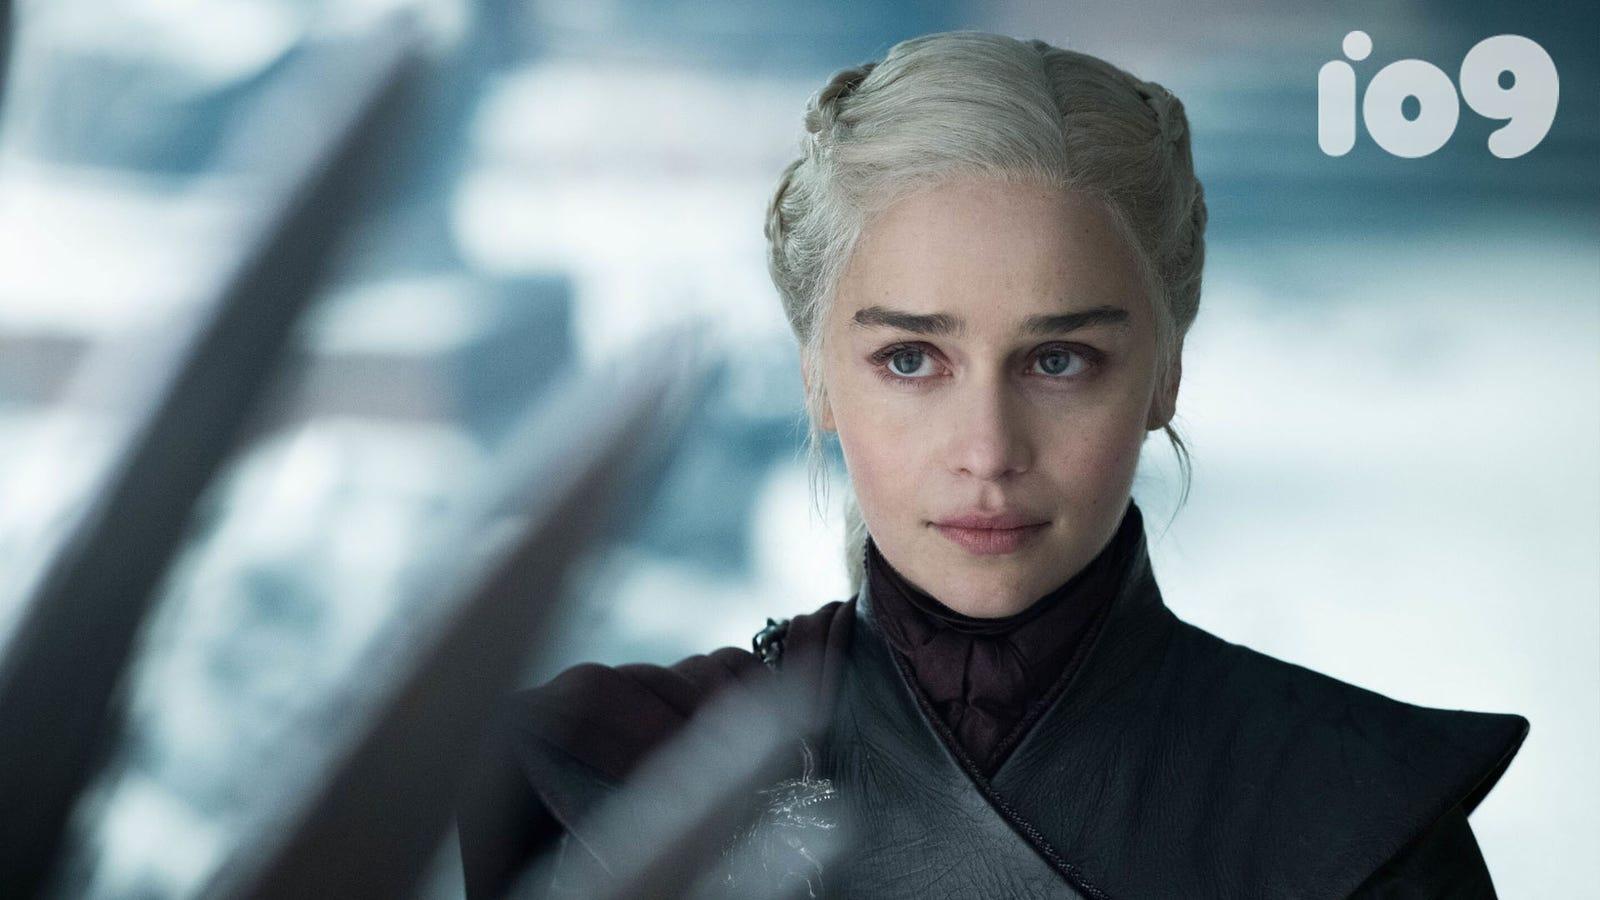 The Fiery Rise (and Nuclear Fall) of Daenerys Targaryen